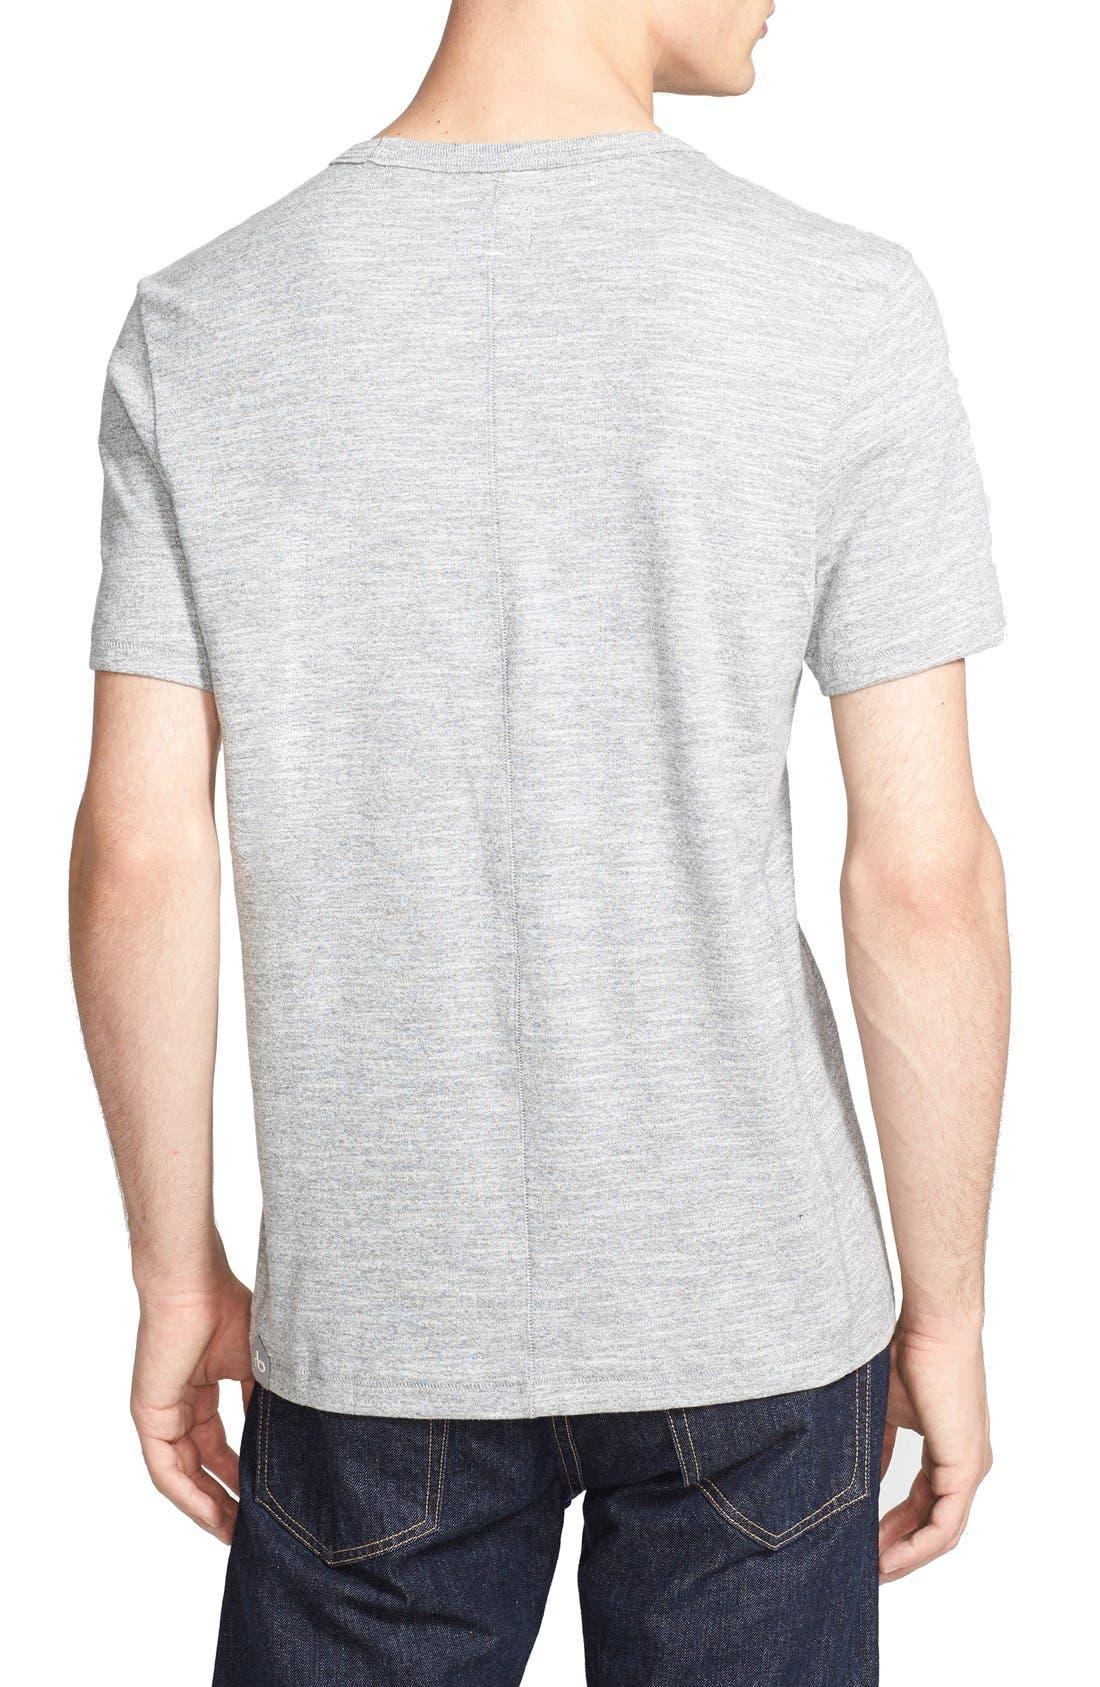 Alternate Image 2  - rag & bone Standard Issue 'Moulinex' Crewneck T-Shirt